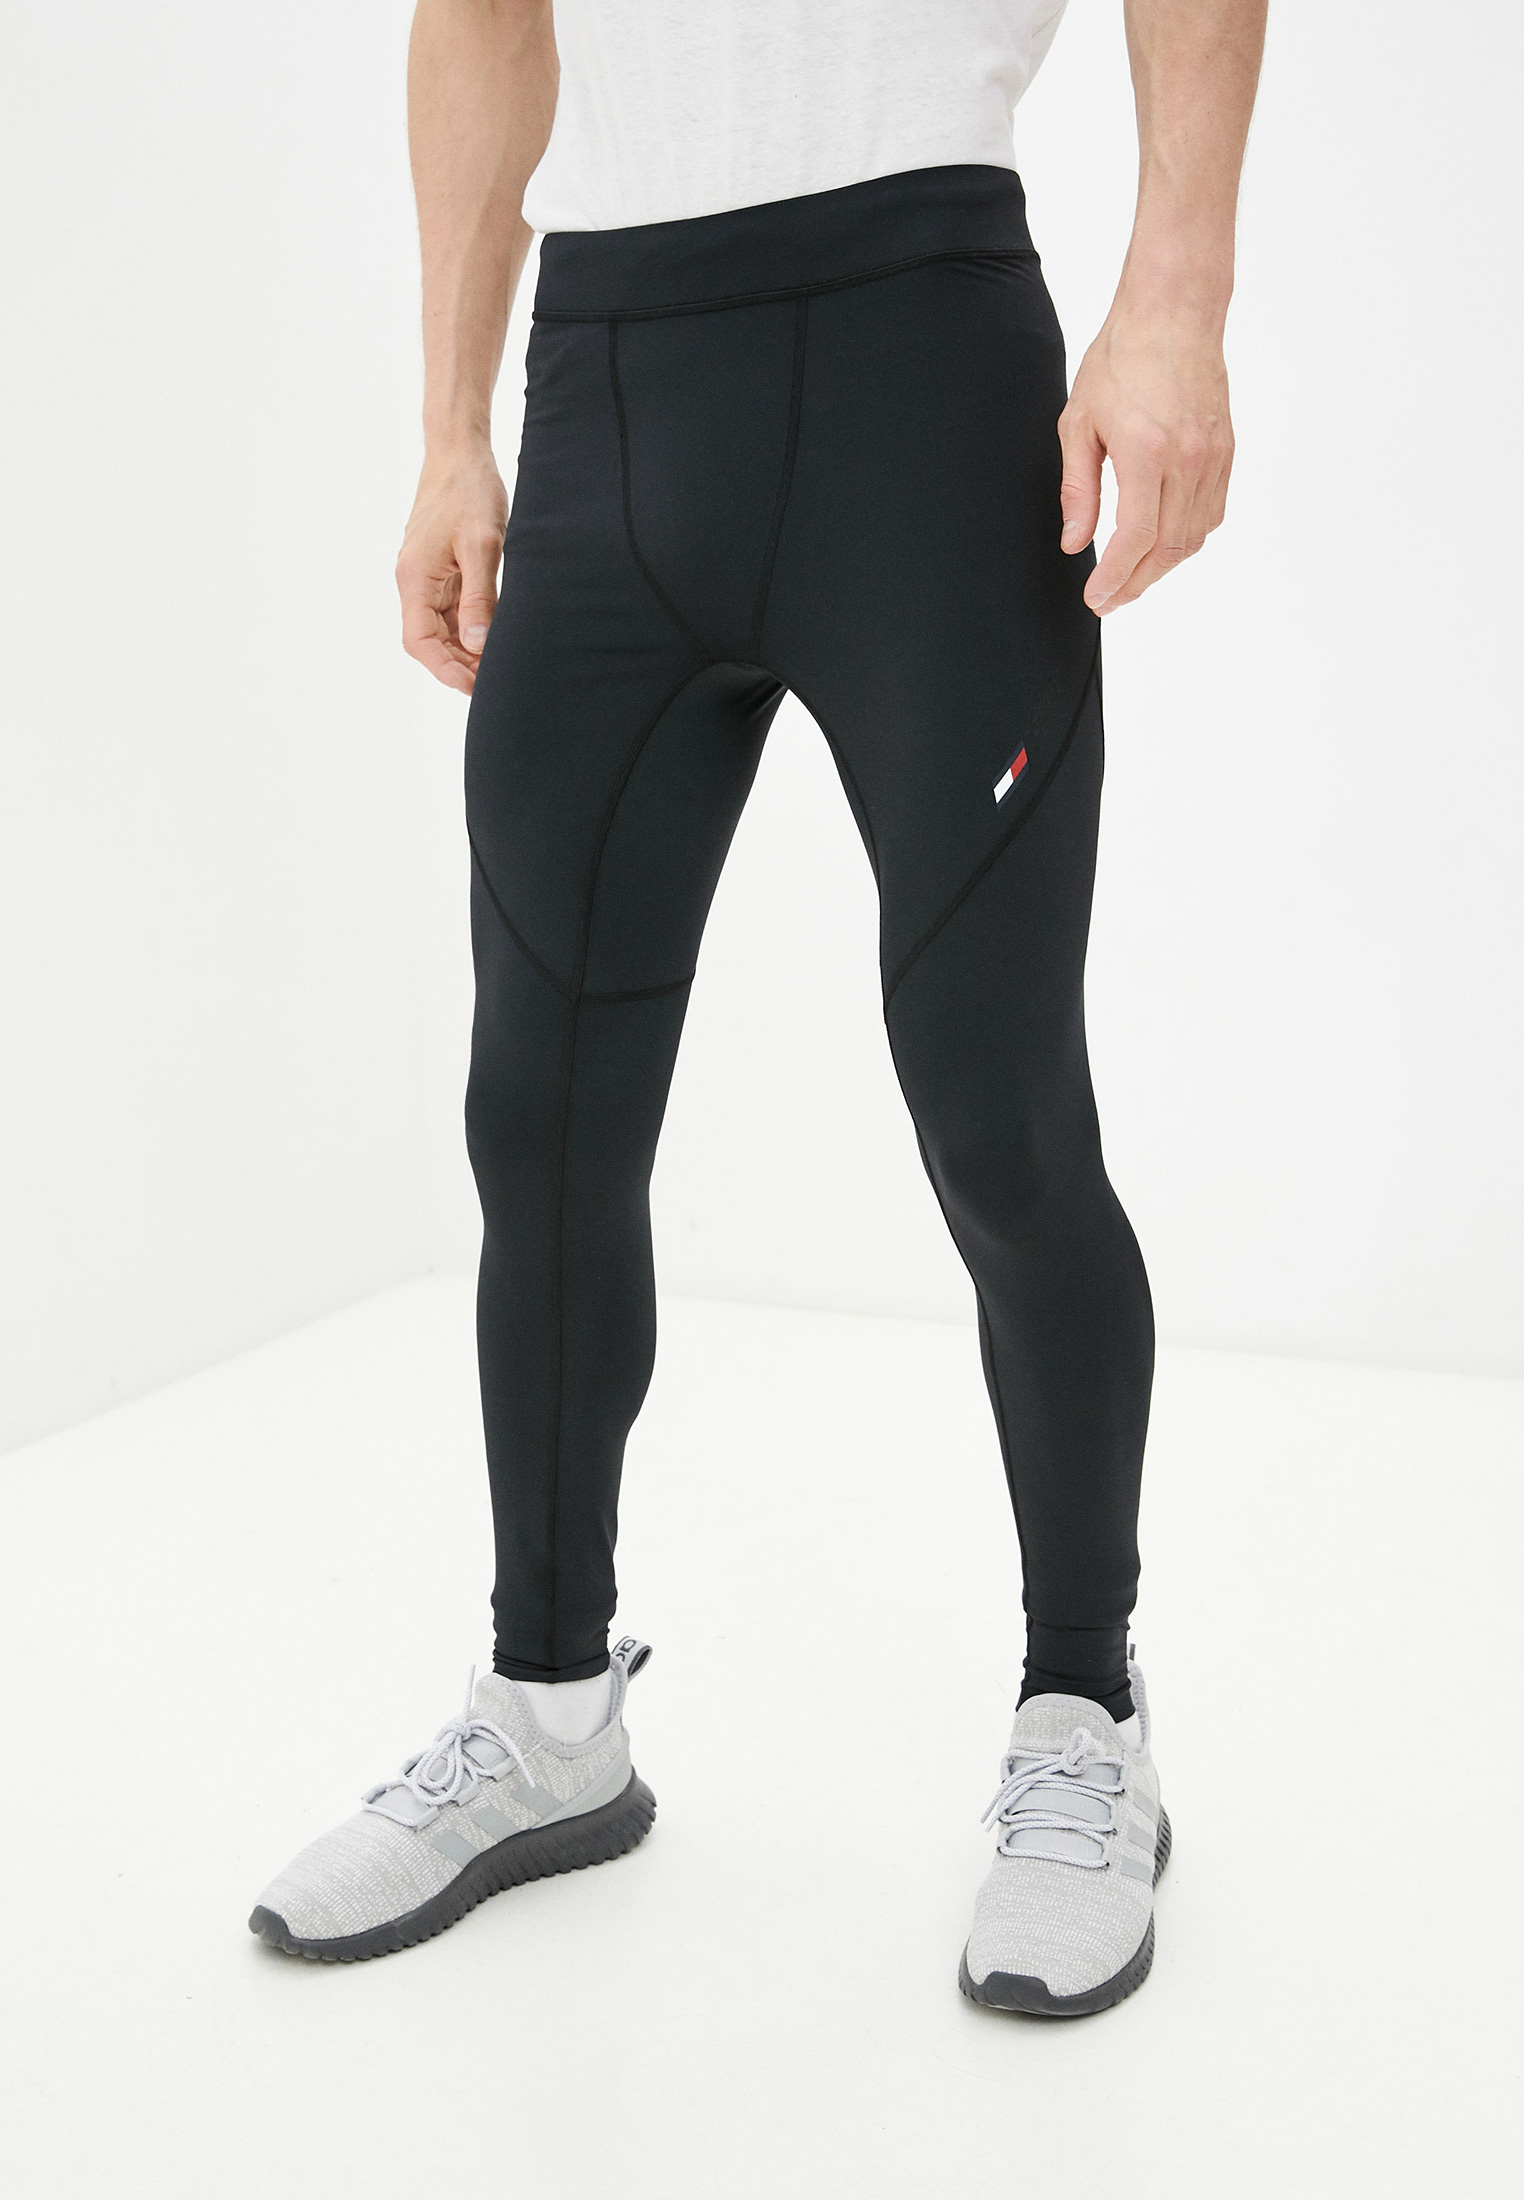 Мужские спортивные брюки Tommy Hilfiger (Томми Хилфигер) MW0MW17262